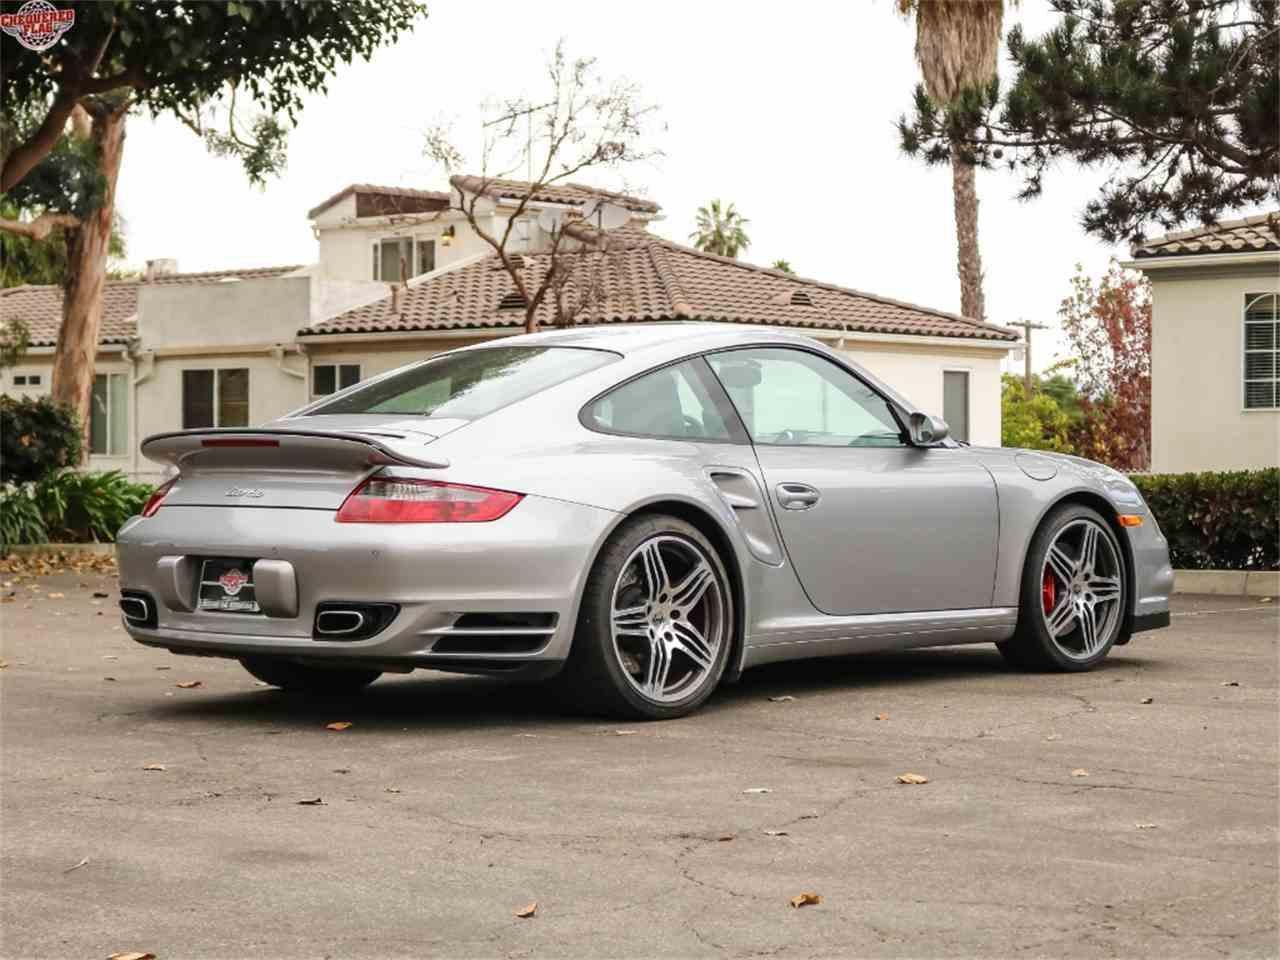 Large Picture of 2007 Porsche 911 located in Marina Del Rey California - $112,500.00 - M8ZR